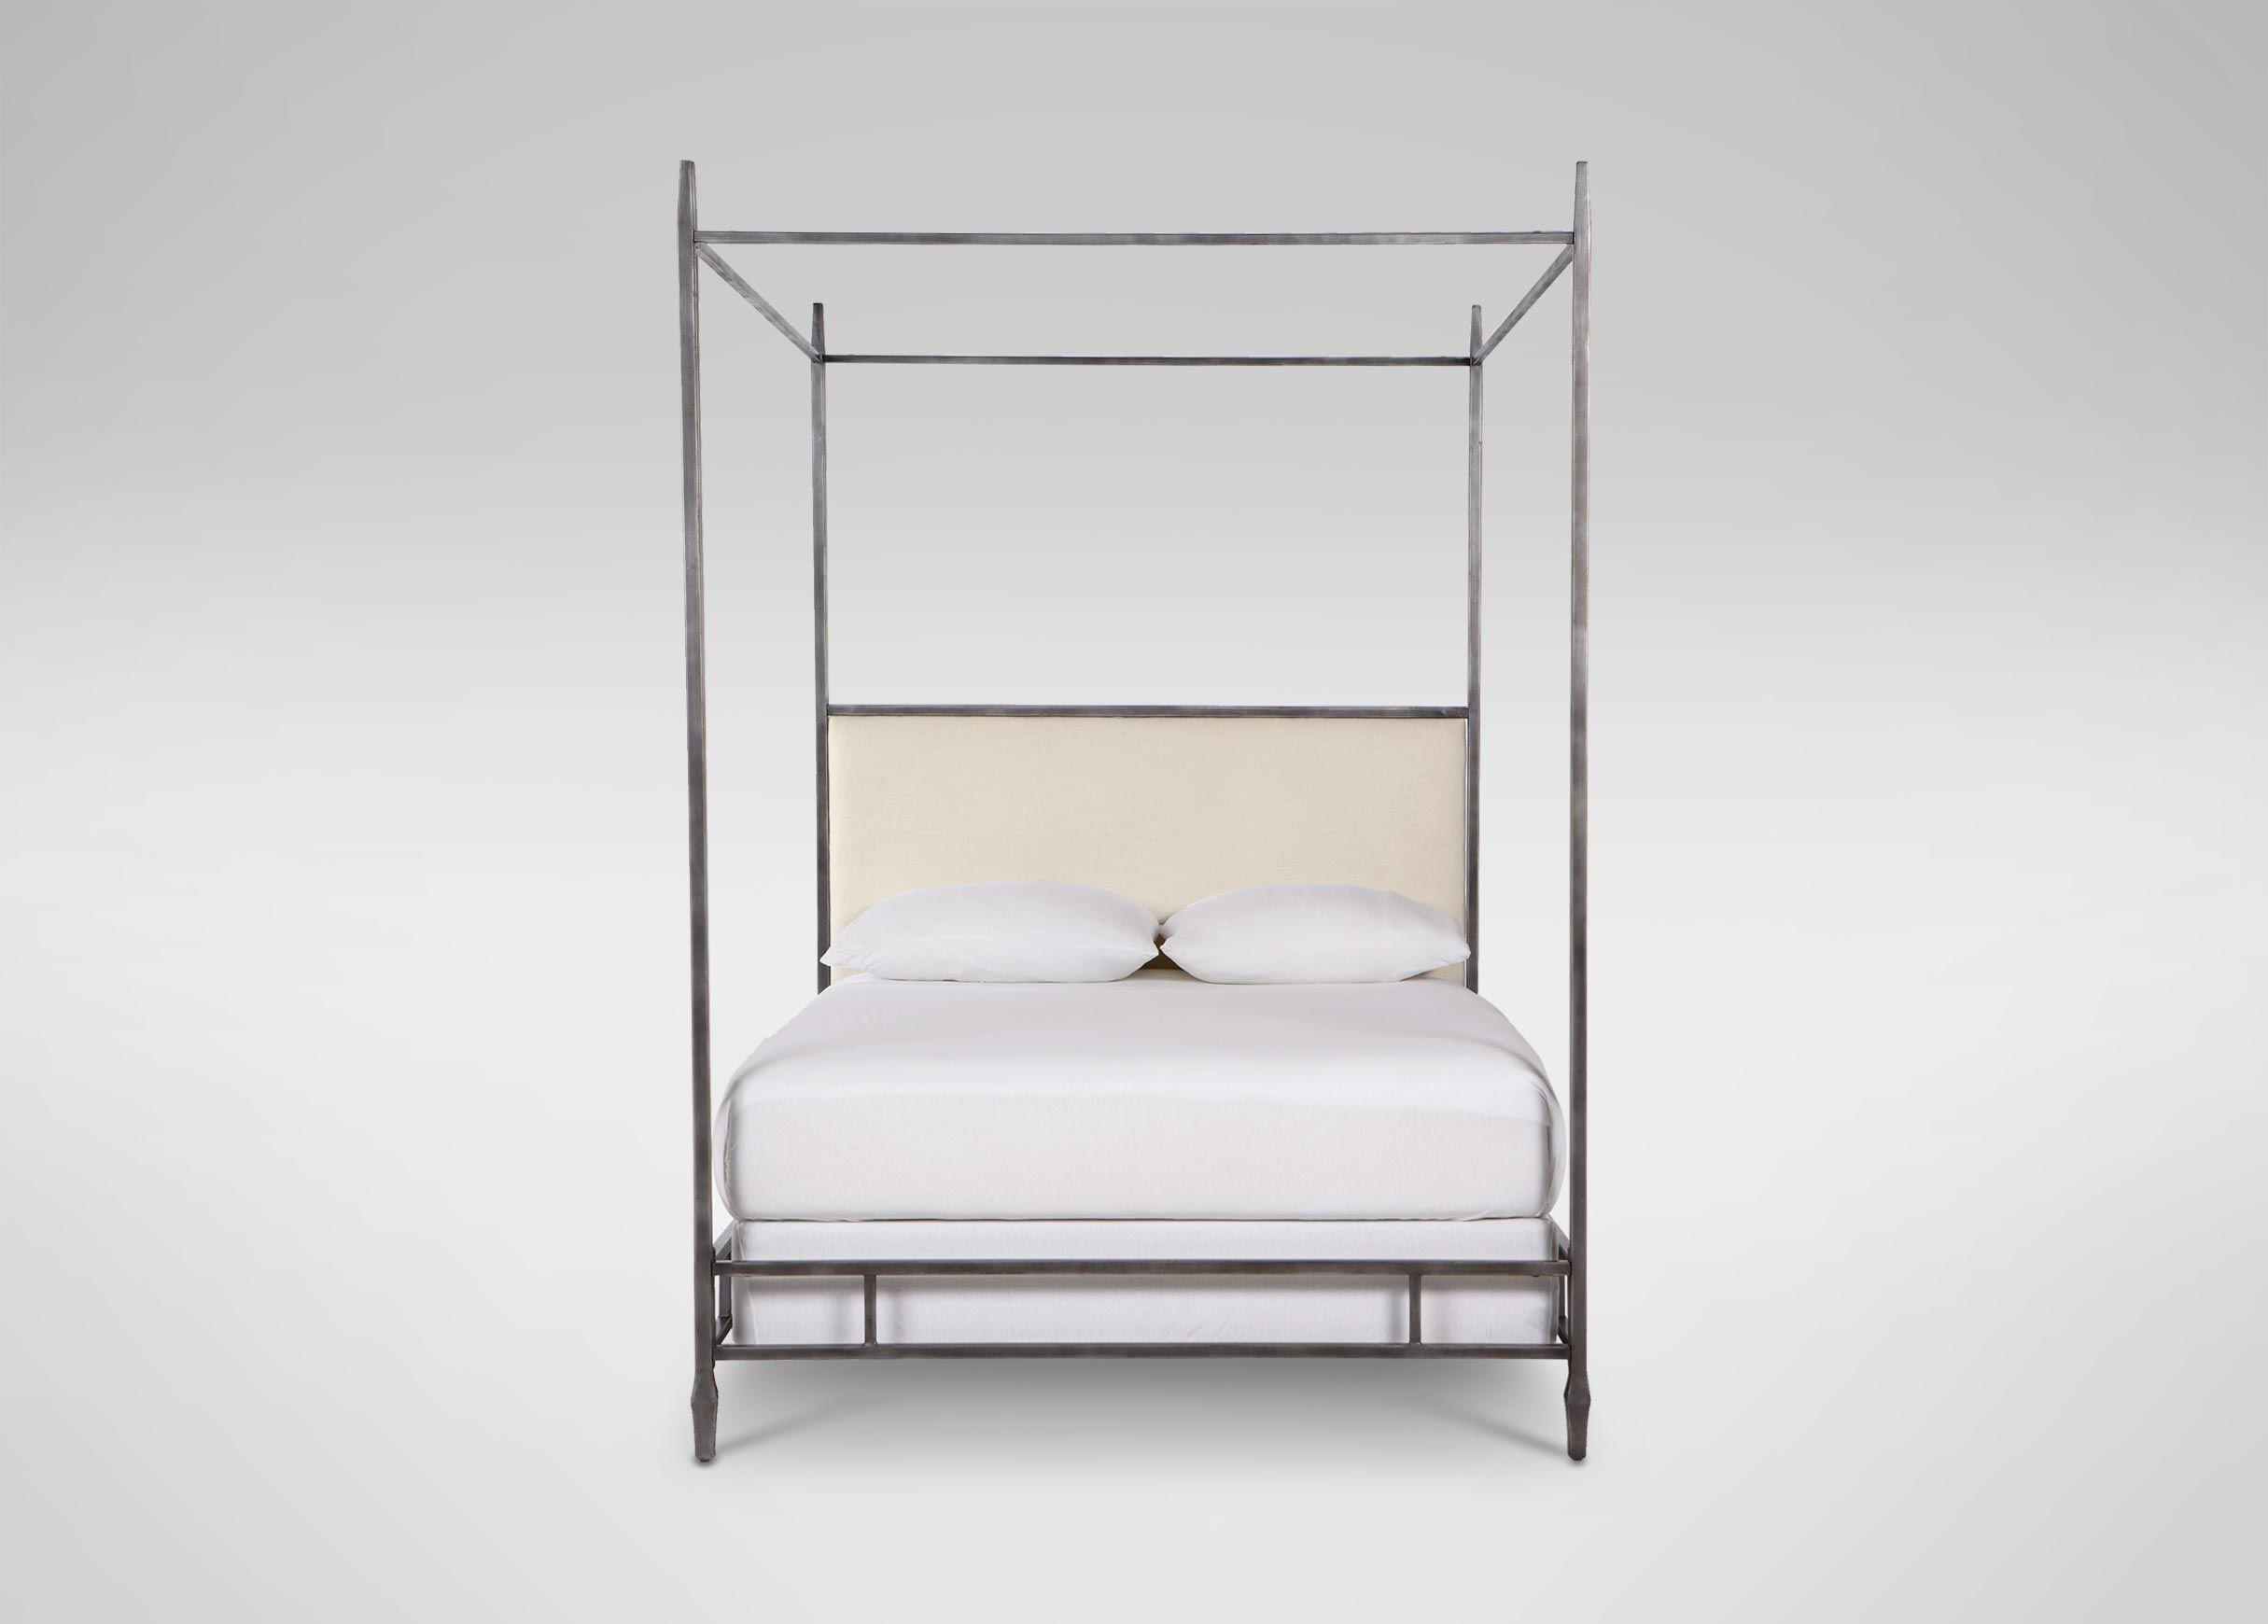 Lincoln upholstered poster bed ethan allen us house pinterest